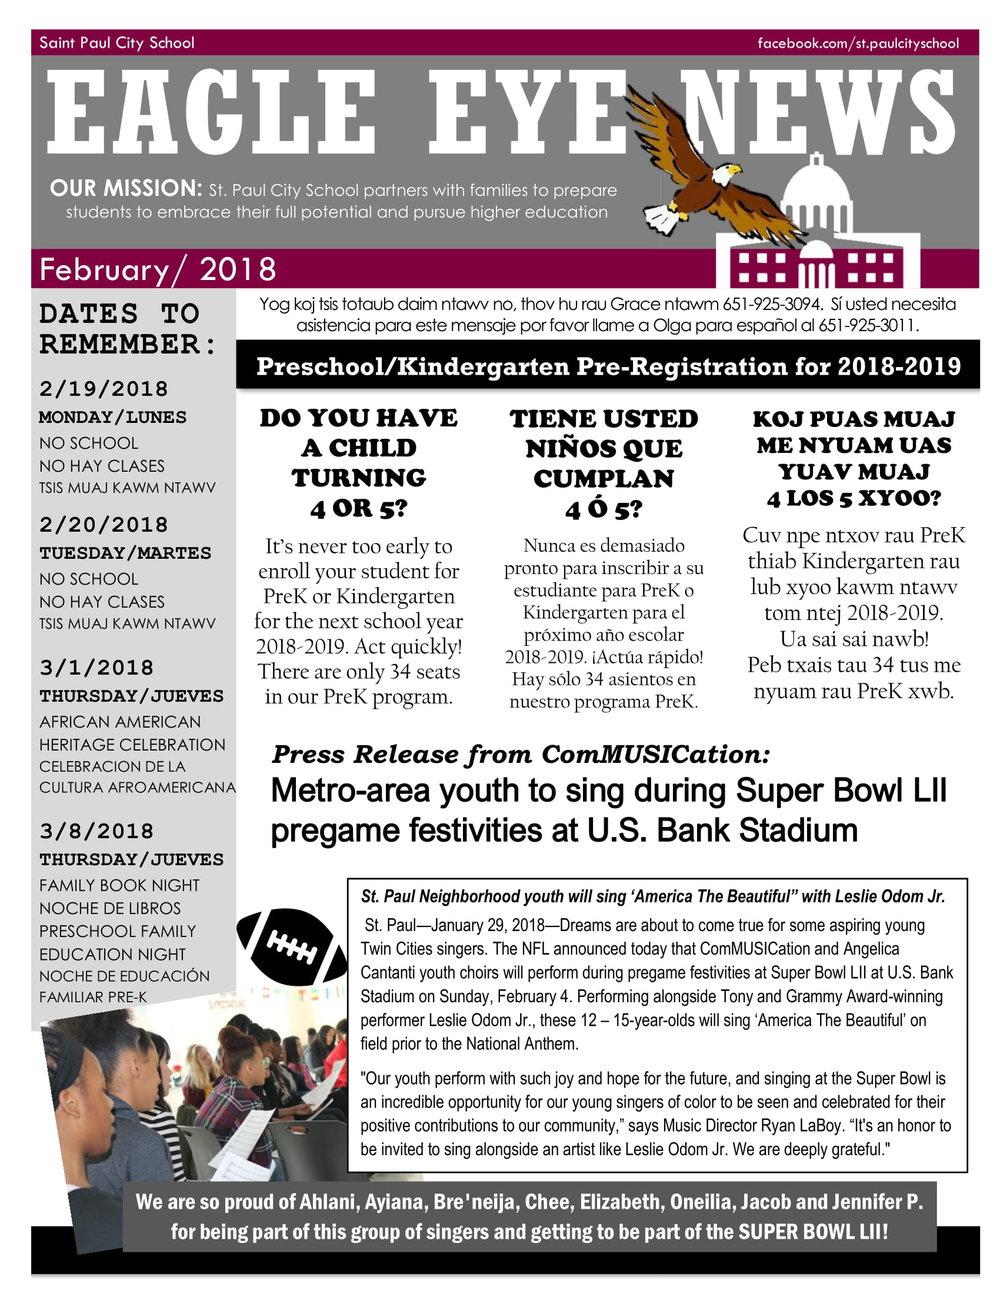 FEBRUARYNewsletterFINAL-1.jpg